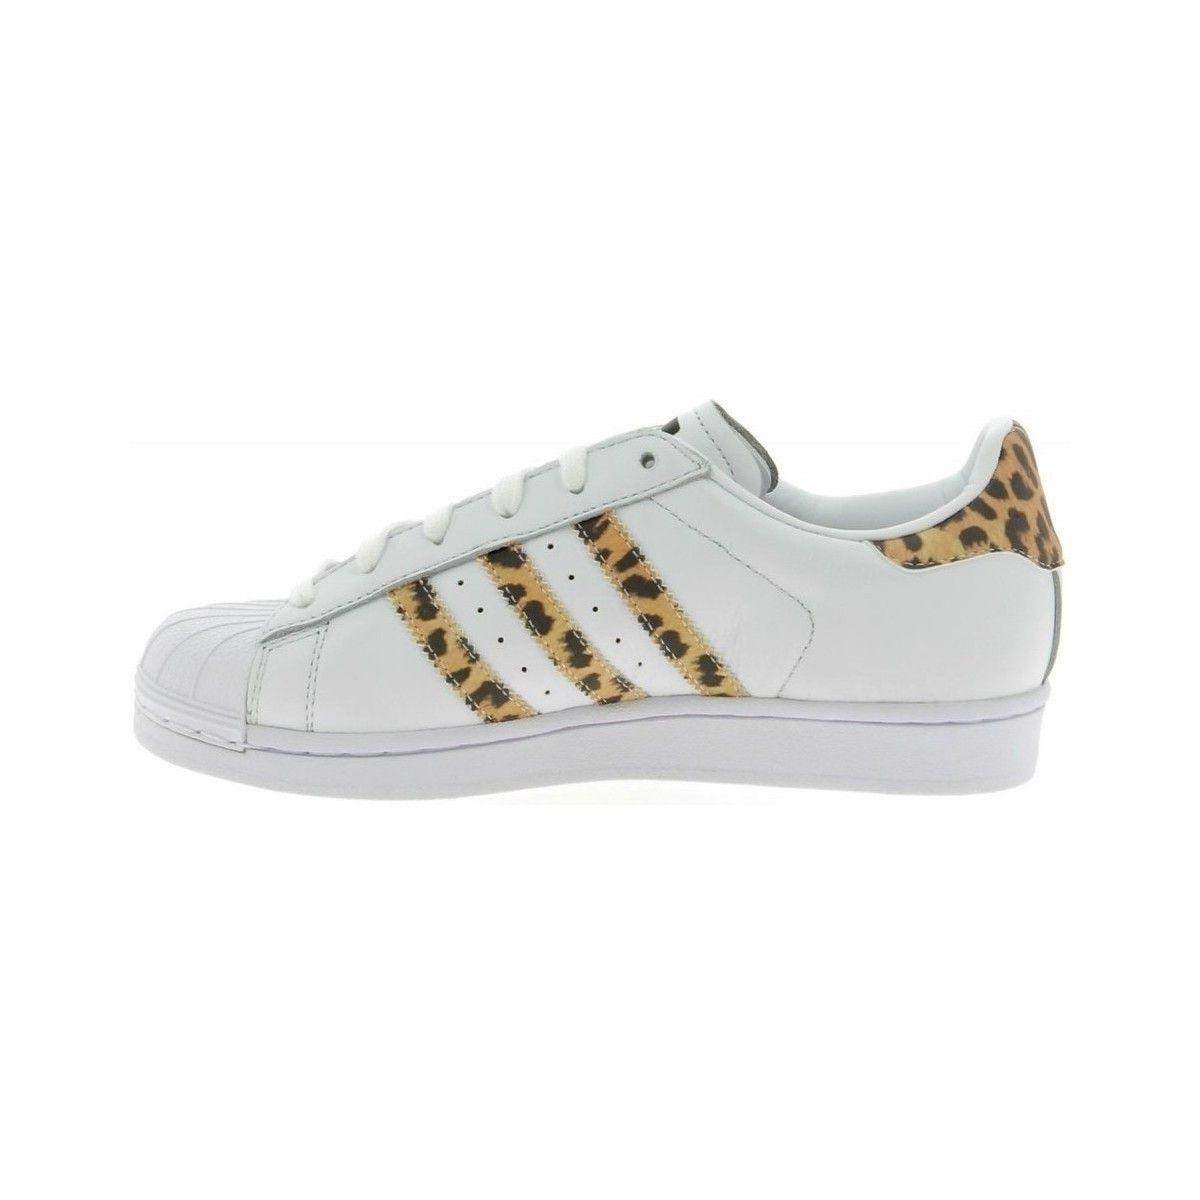 new product f2206 15599 Adidas Originals Basket adidas Originals Superstar - CQ2514. Loading zoom